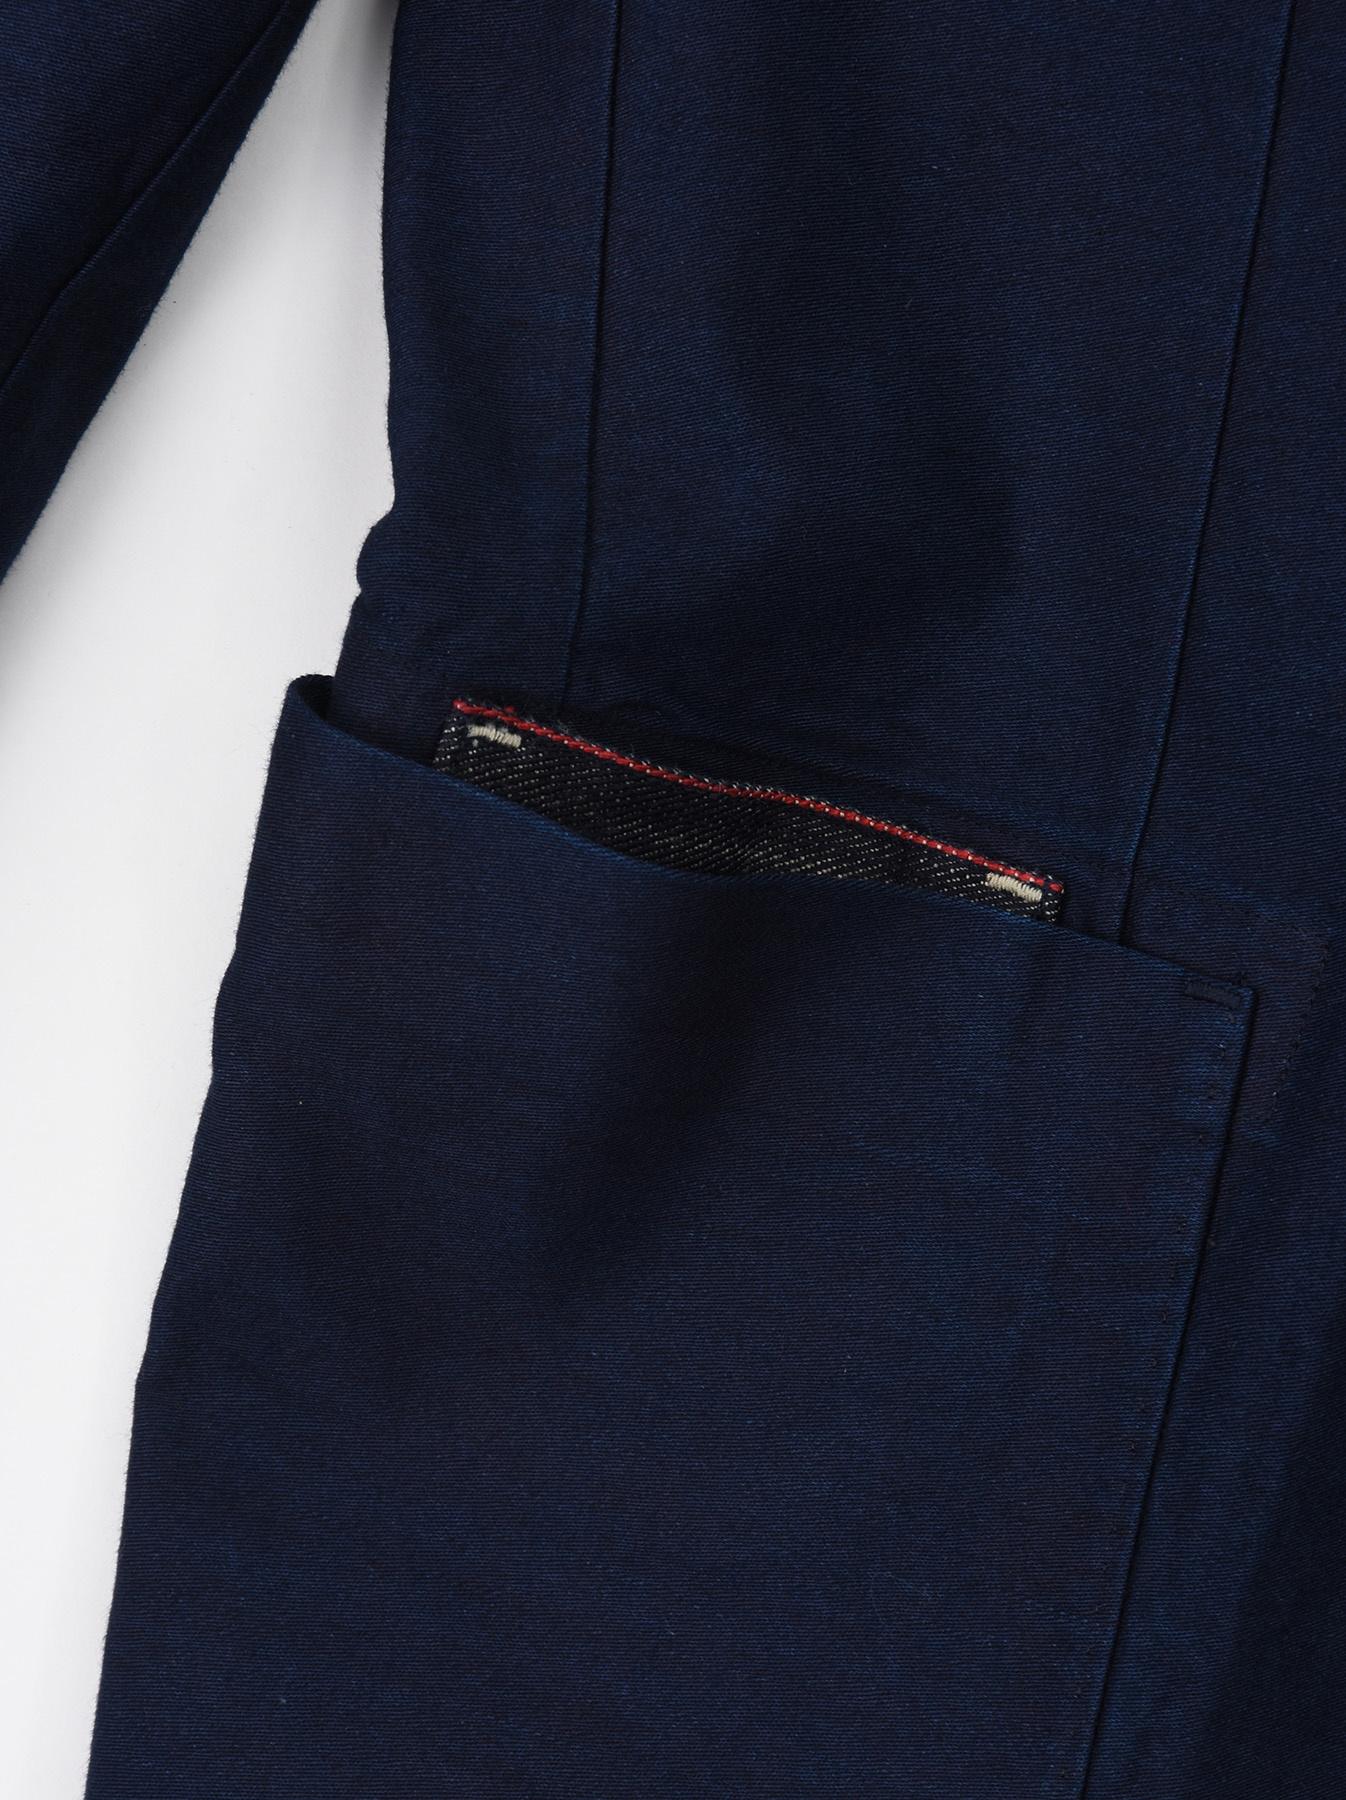 Indigo Mugi Yoko-shusi Soroe Double Breasted Jacket-8